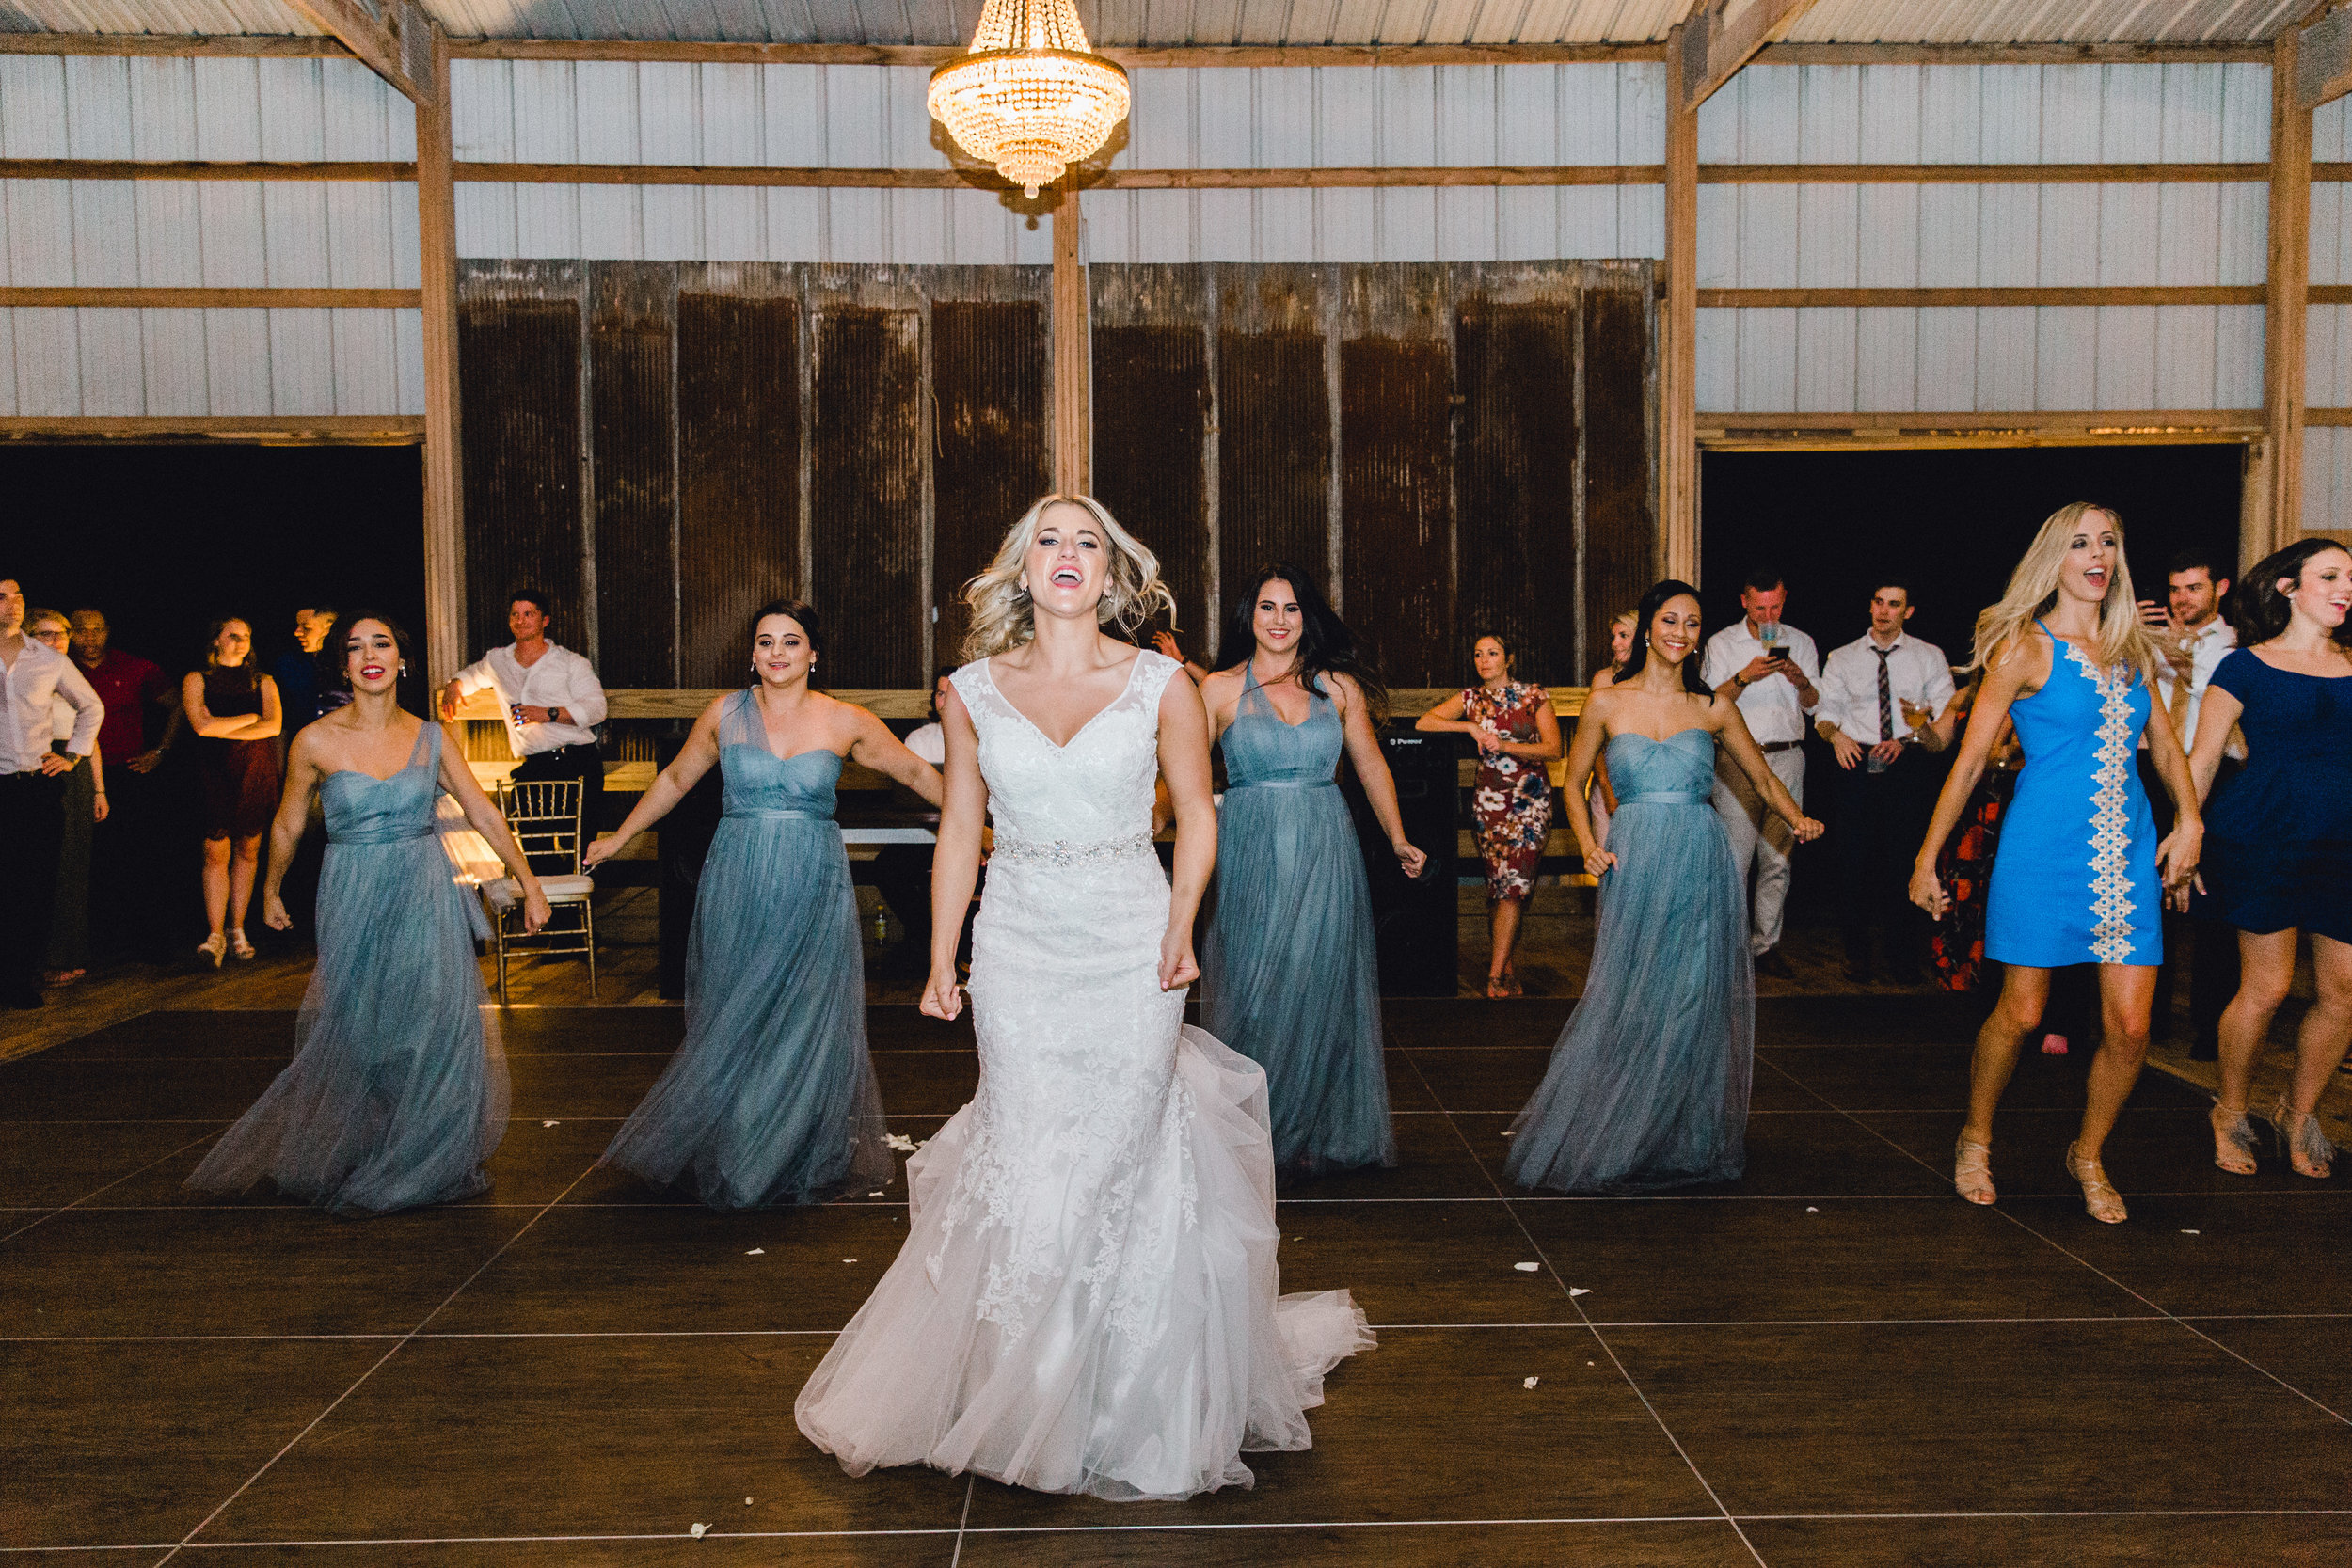 Paige-Mercer-Photography-Florida-Wedding-Photographer-Alyssa&Drew-107.jpg